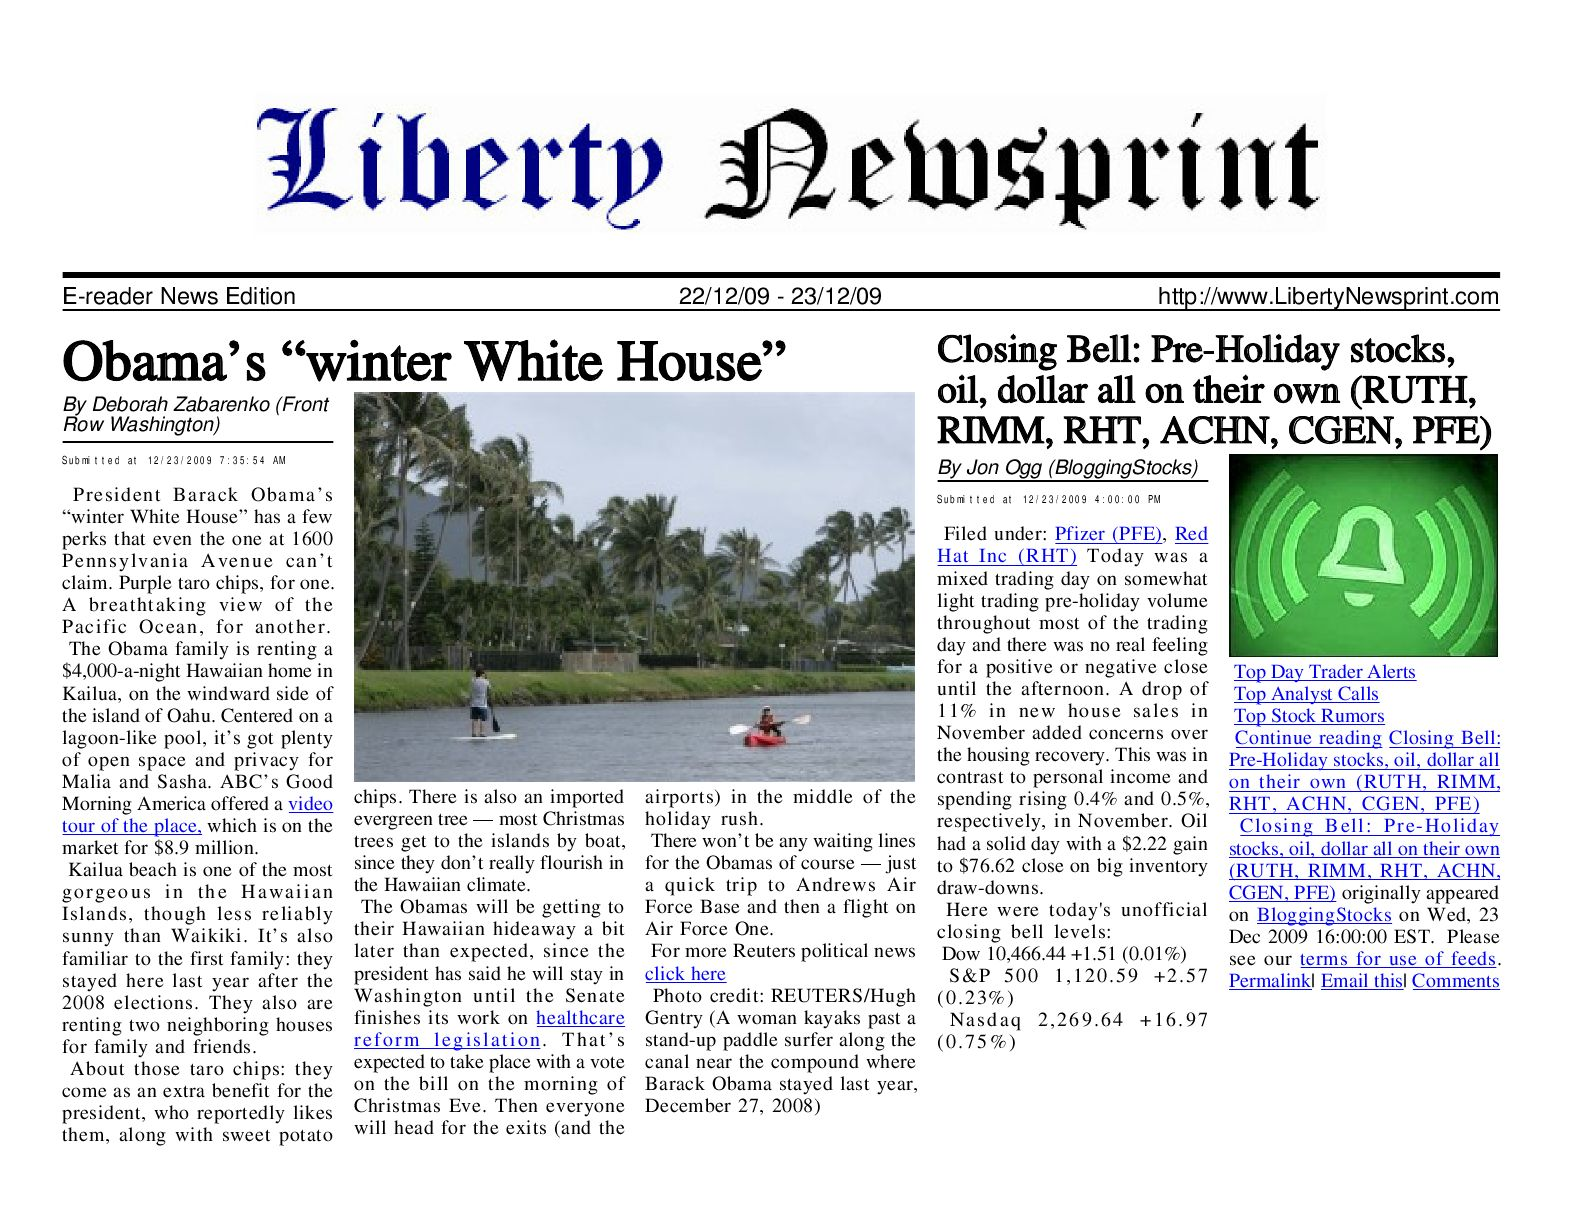 Liberty newsprint dec 23 09 by liberty newspost issuu fandeluxe Gallery